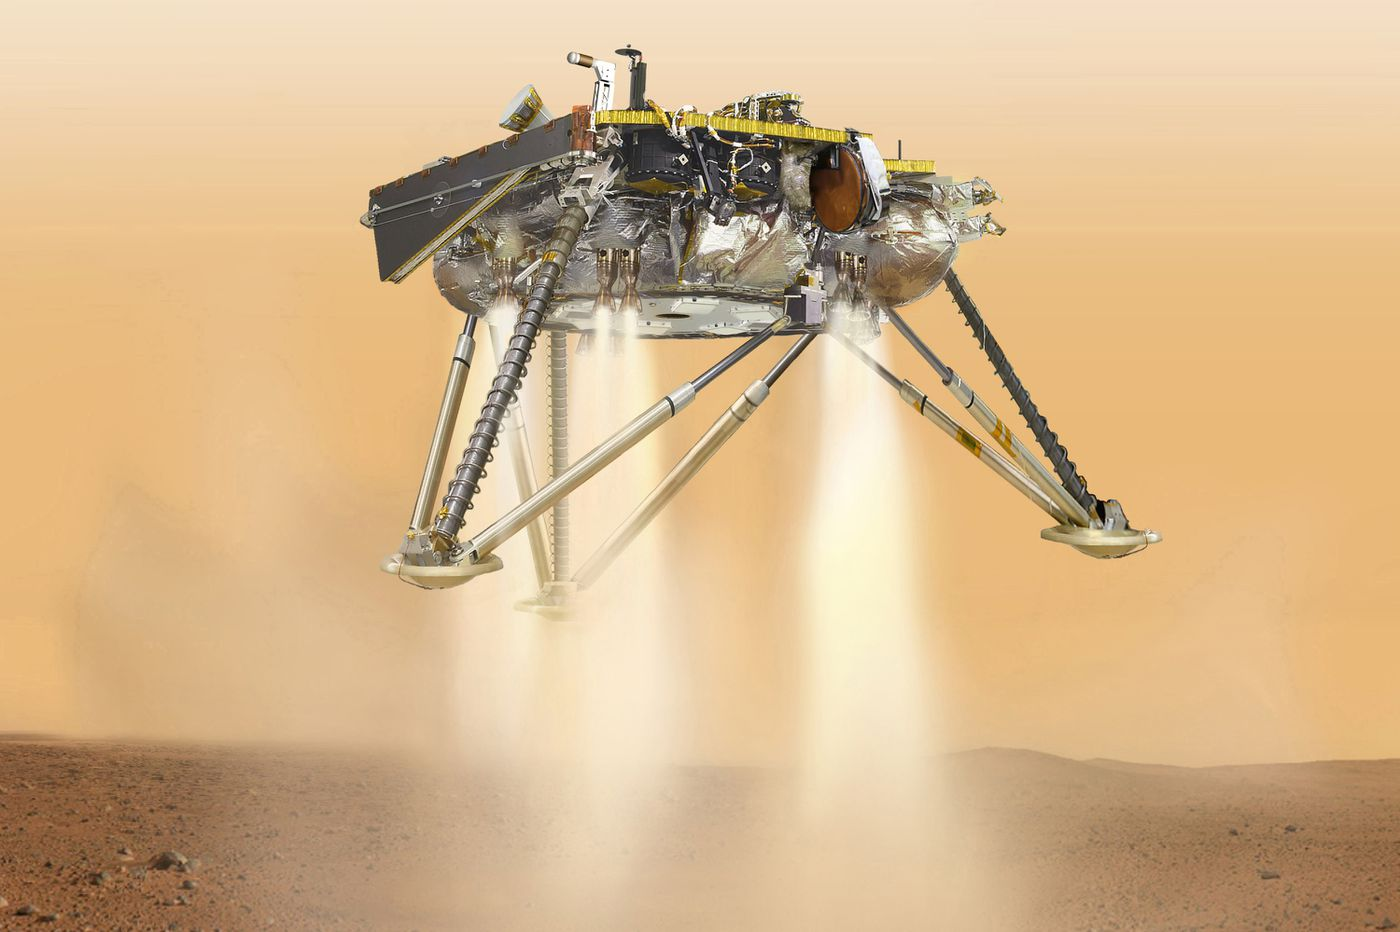 NASA's Mars probe lands, immediately starts sending photos